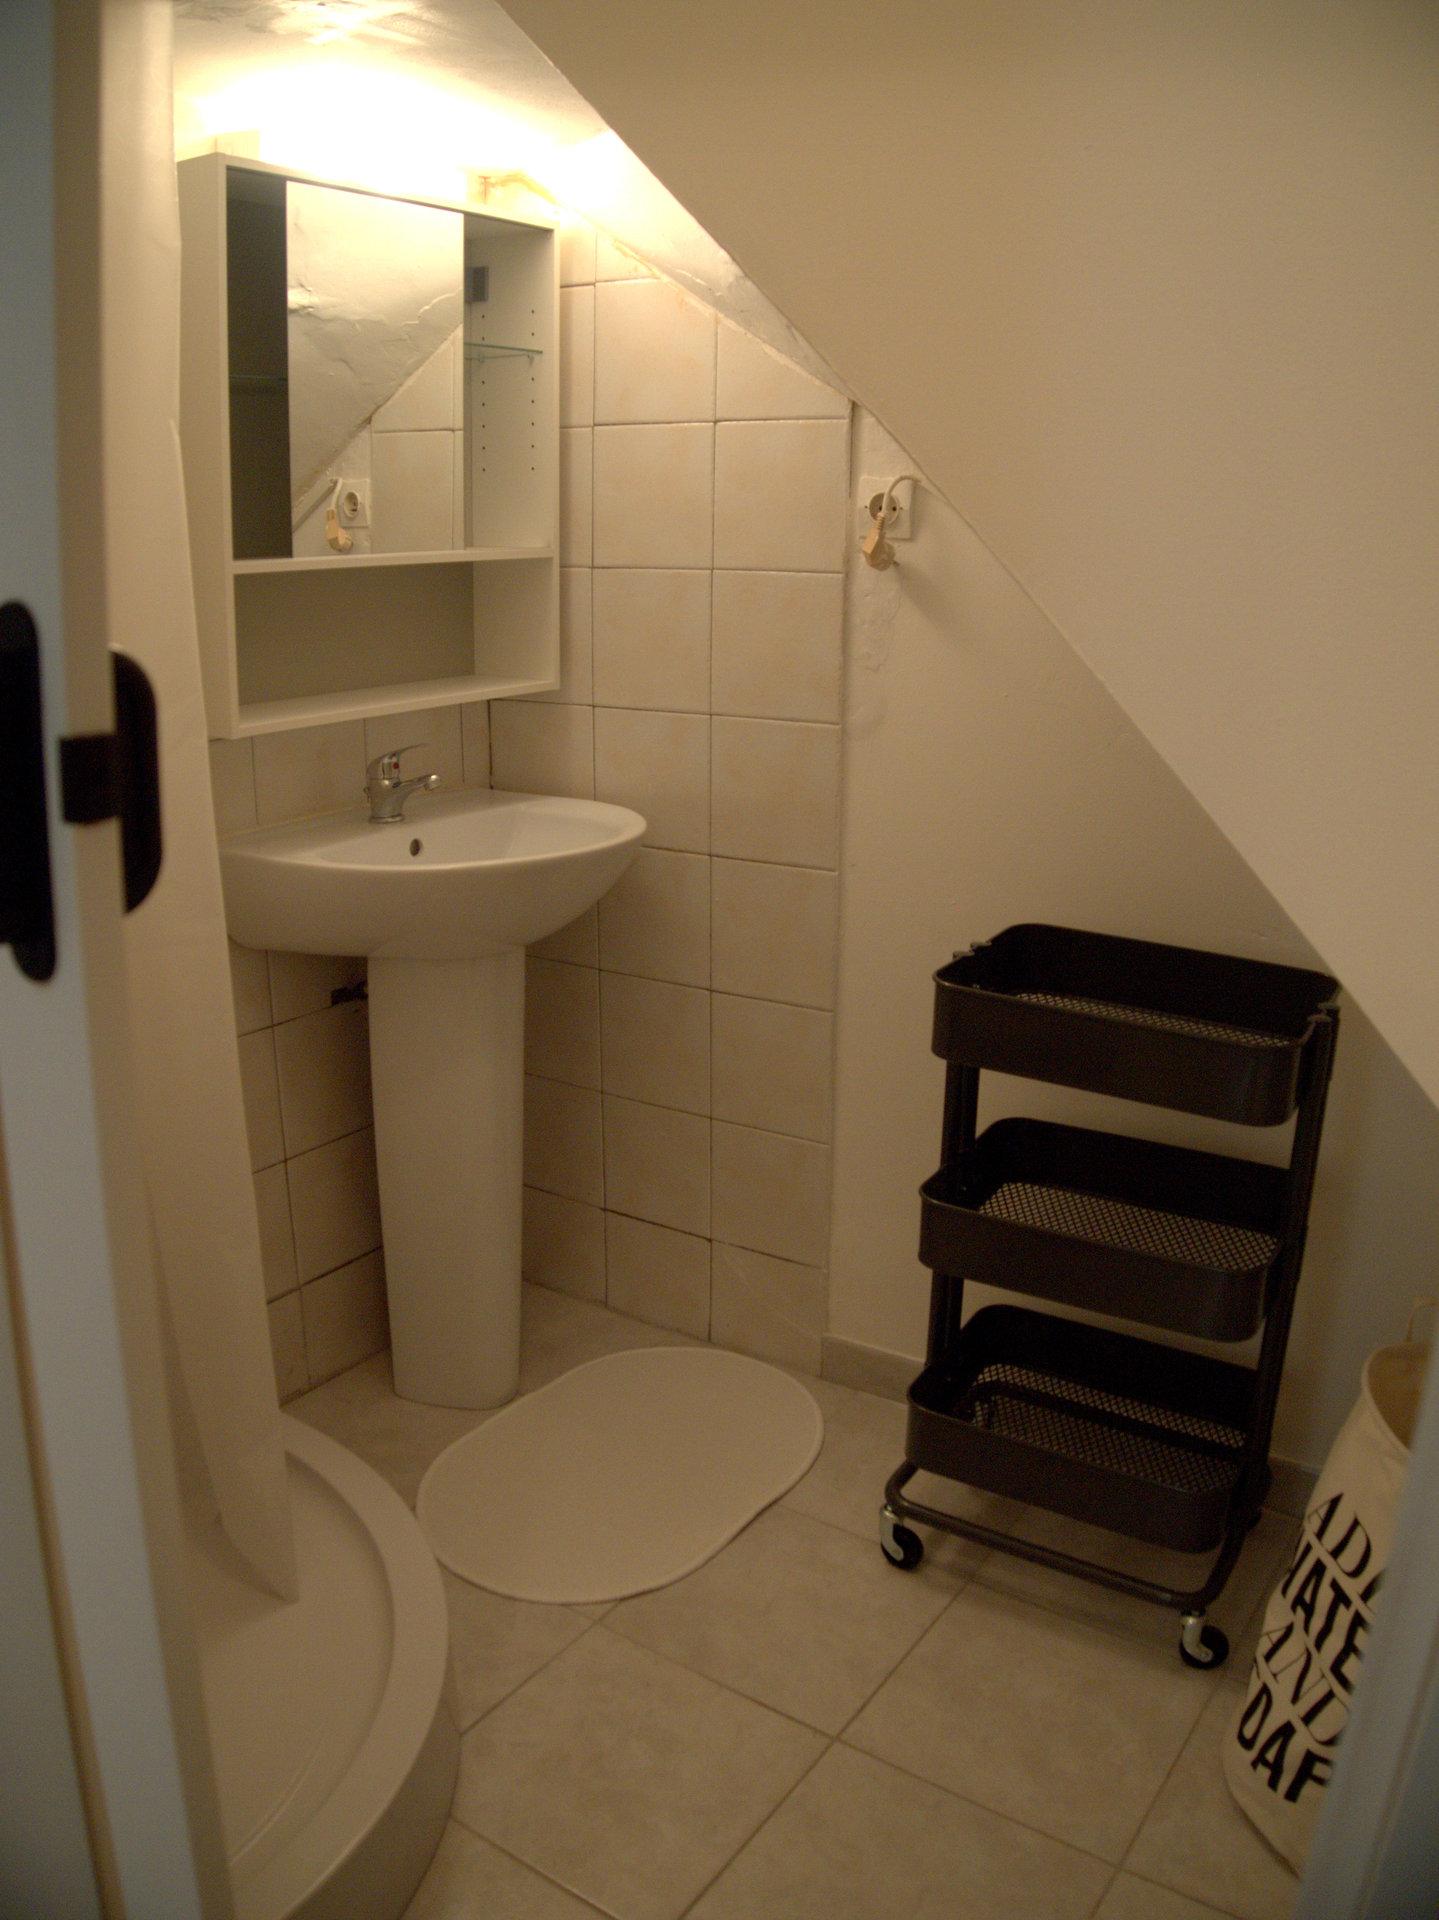 Location Appartement - Marseille 5ème Le Camas